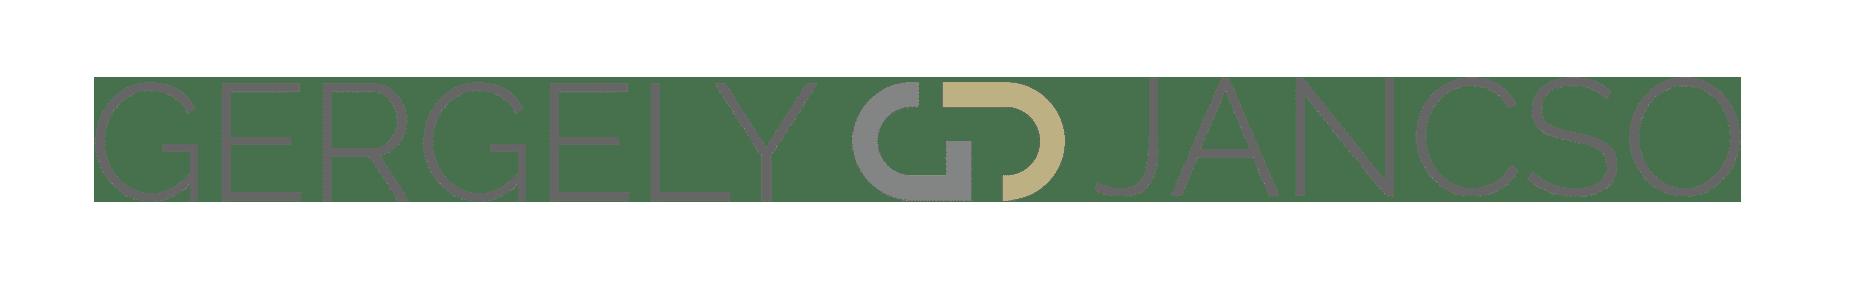 logo_gregjphoto